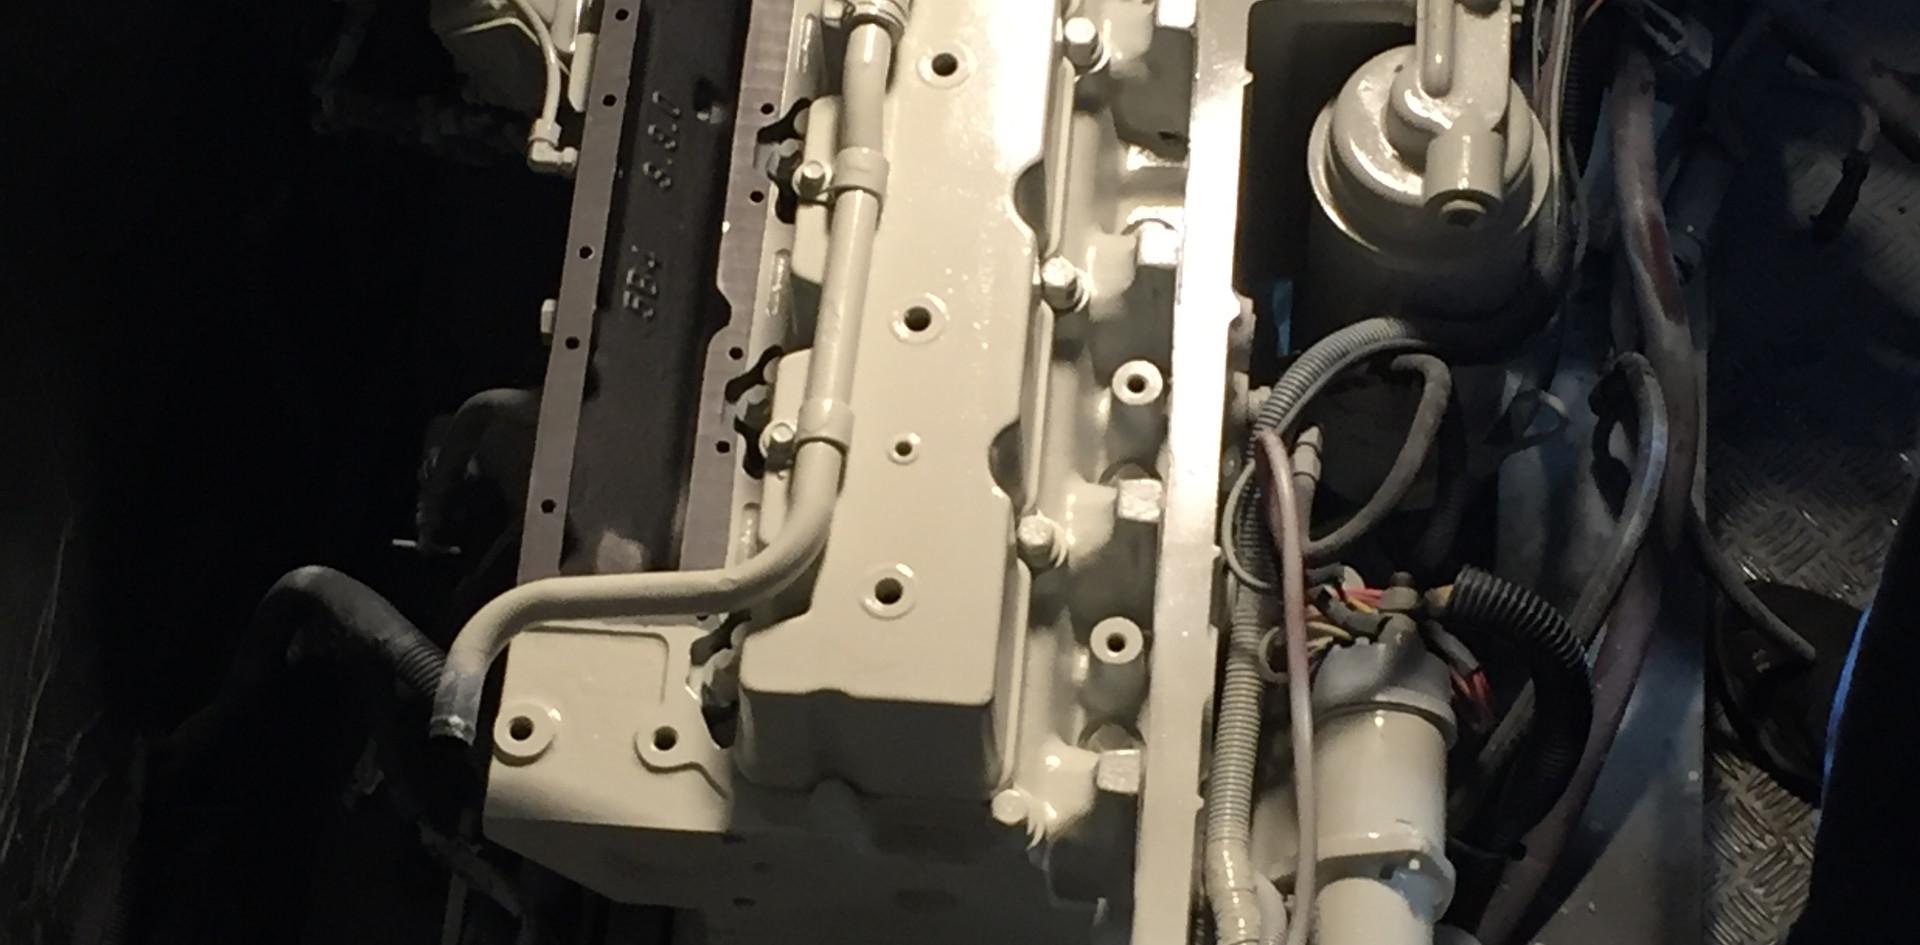 CUMMINS 8.3 L 450 HP Marine Rebuild Niantic CT